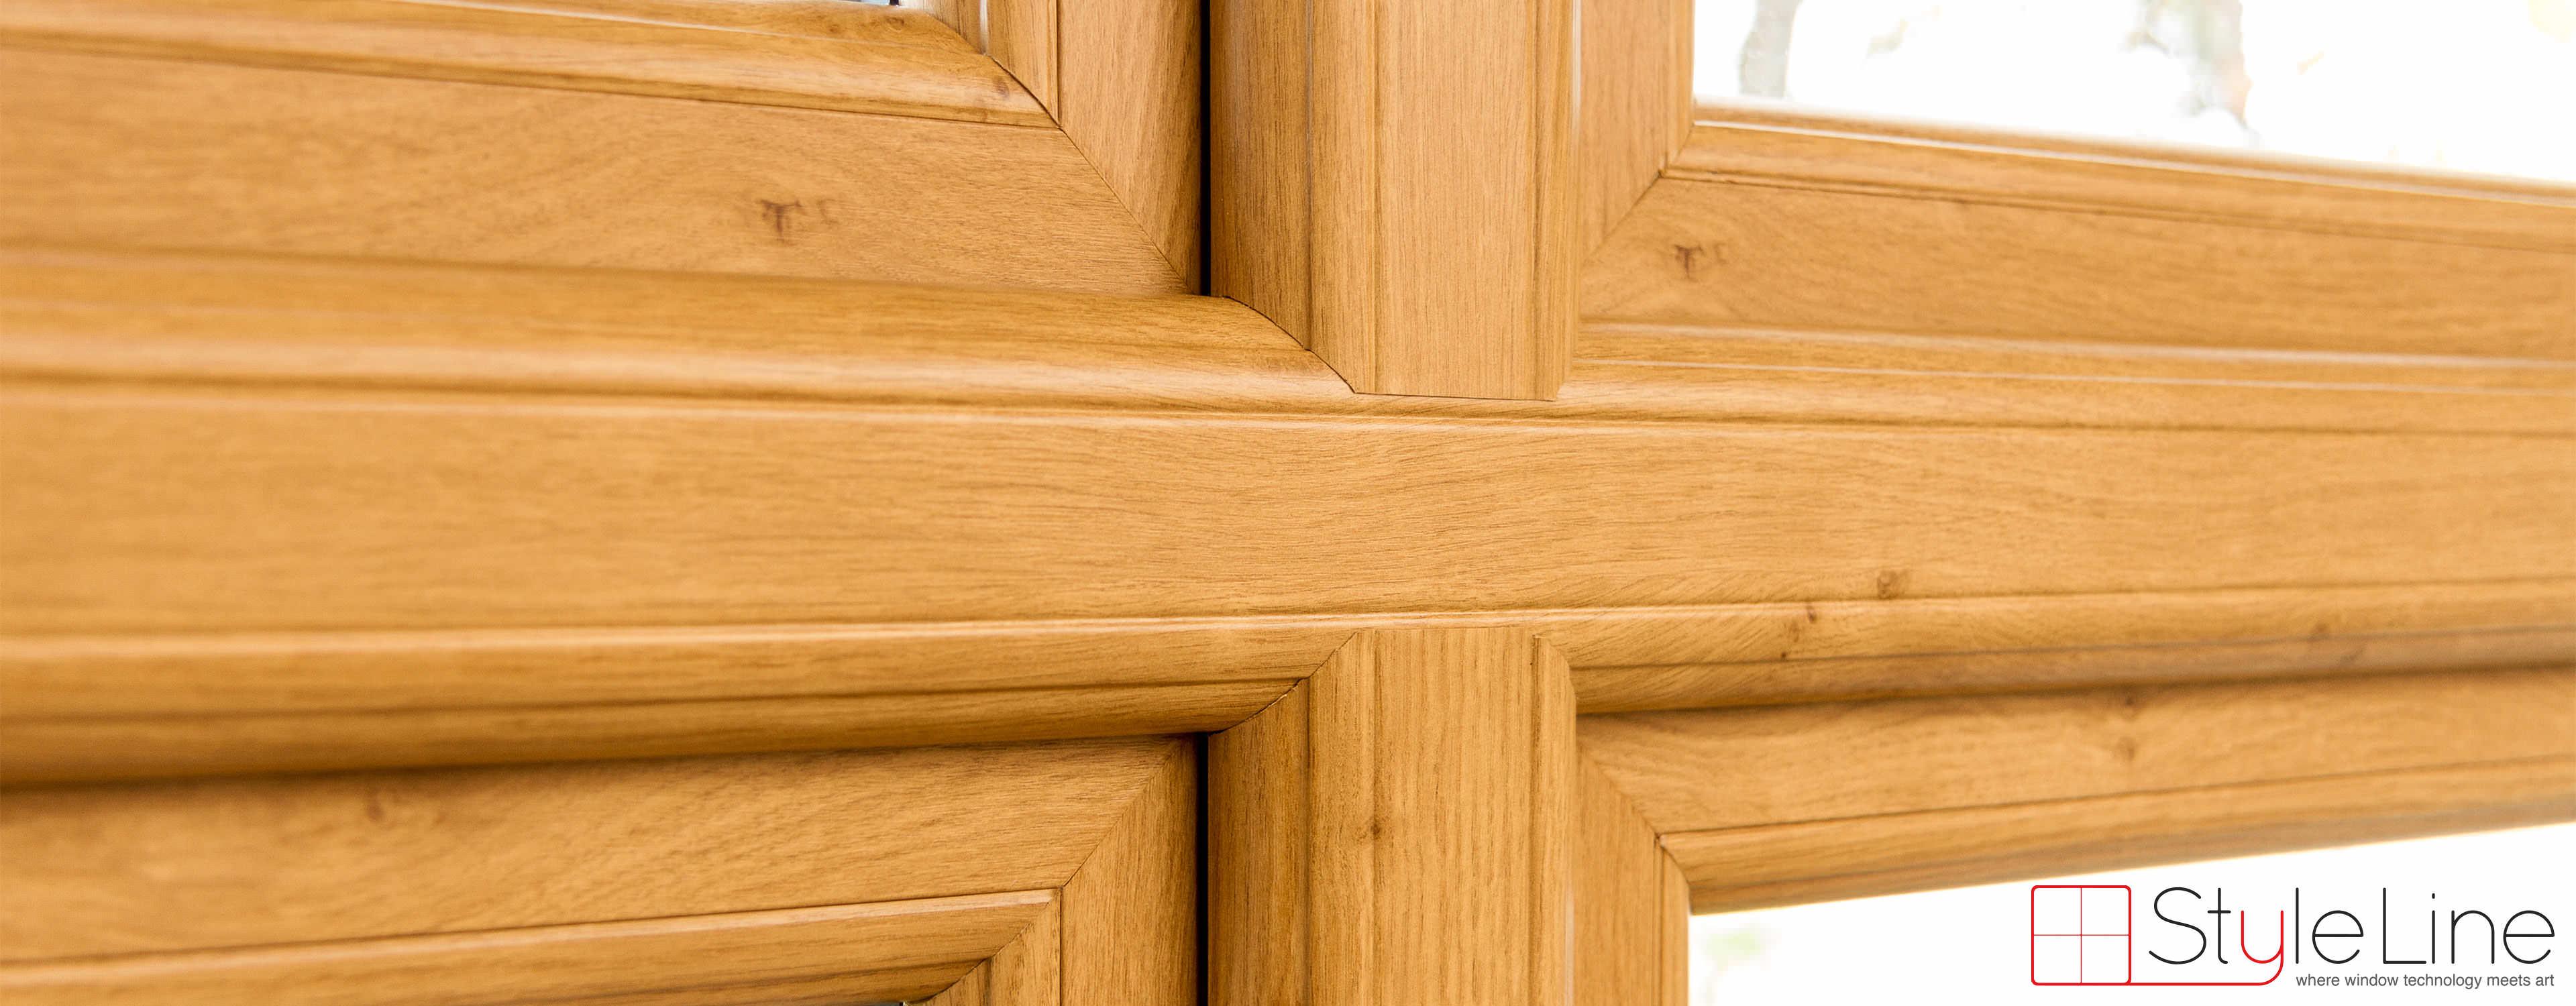 Styleline Doors Nottingham